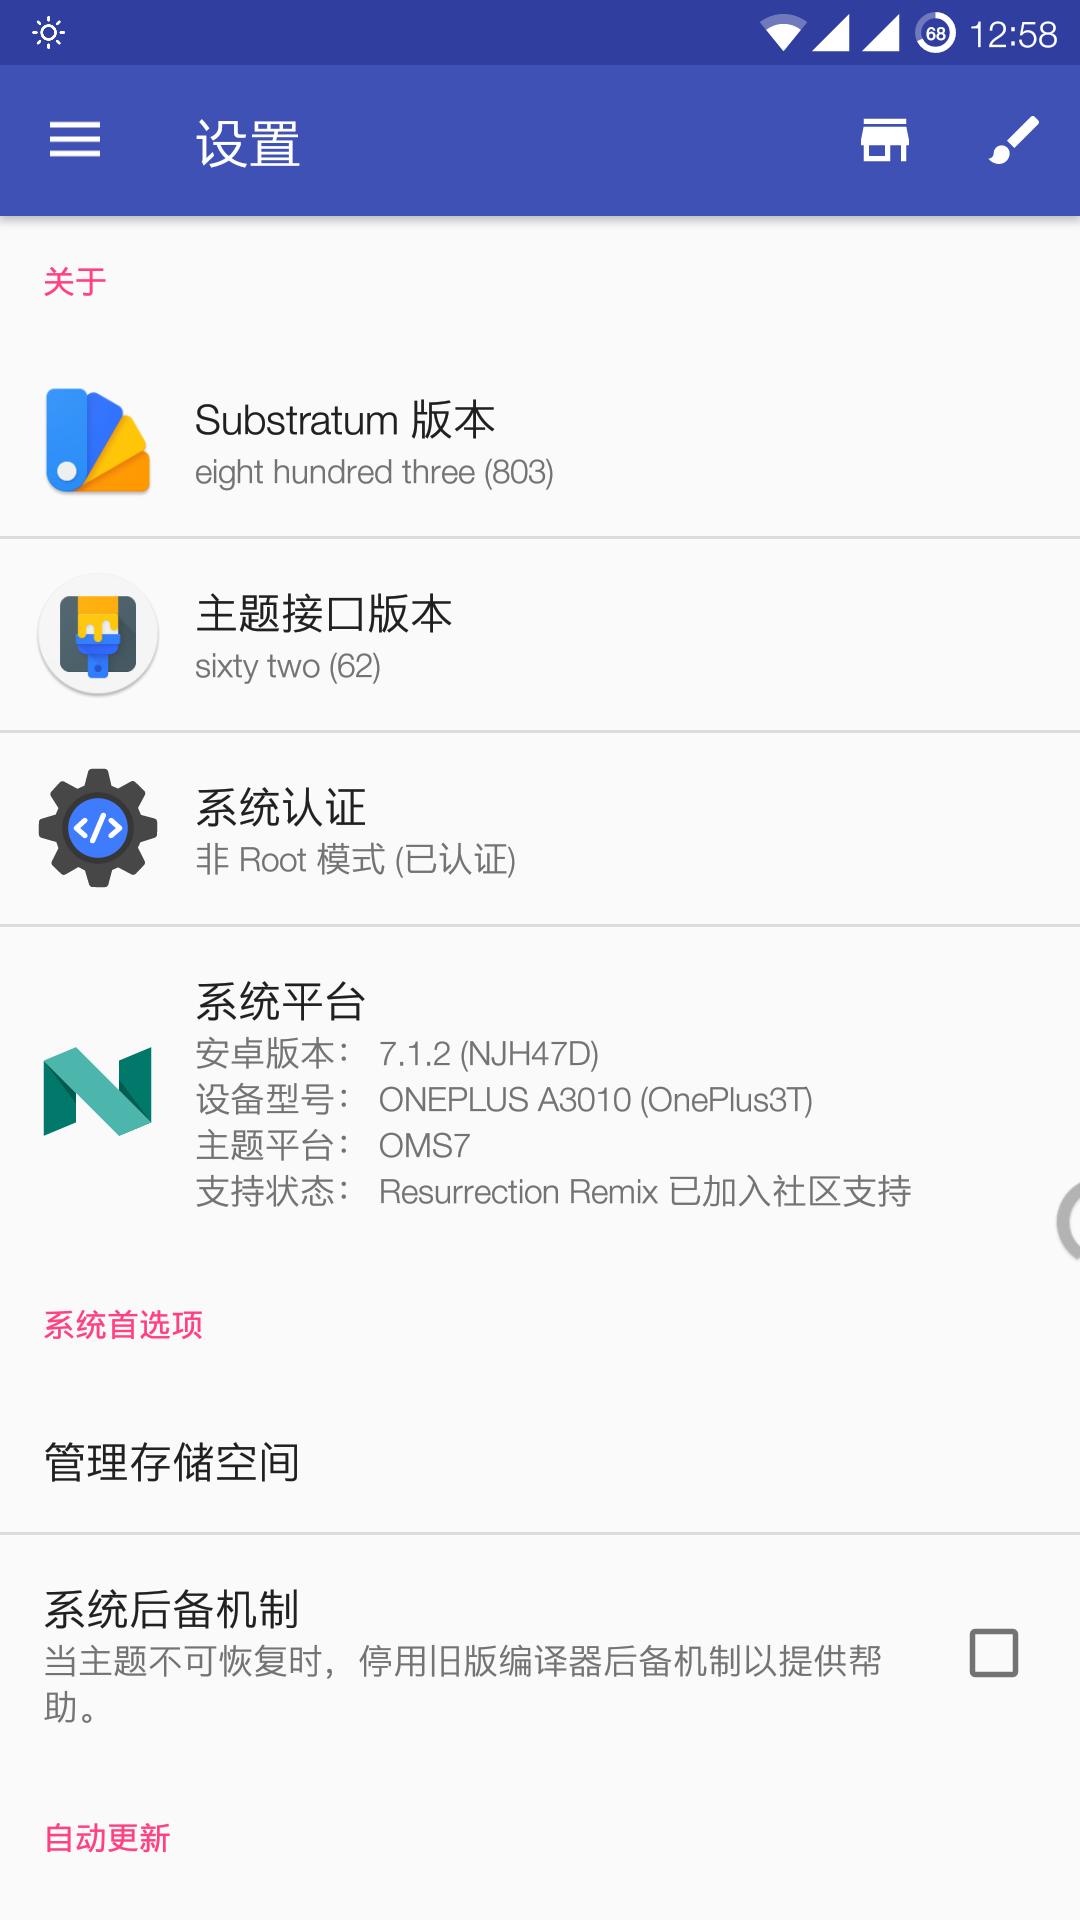 Screenshot_20170713-125822.png